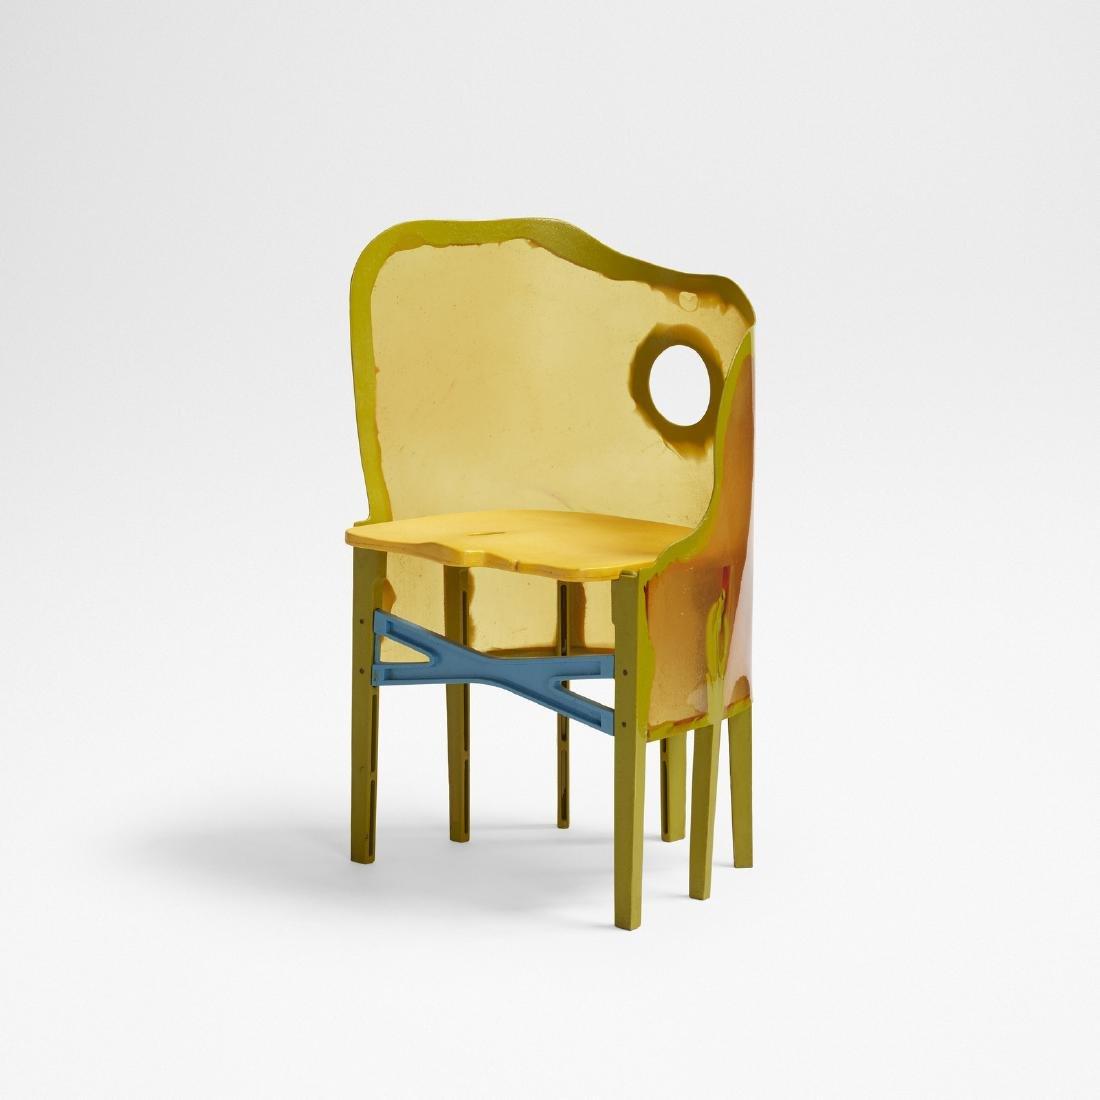 Gaetano Pesce, Open Sky Crosby chair